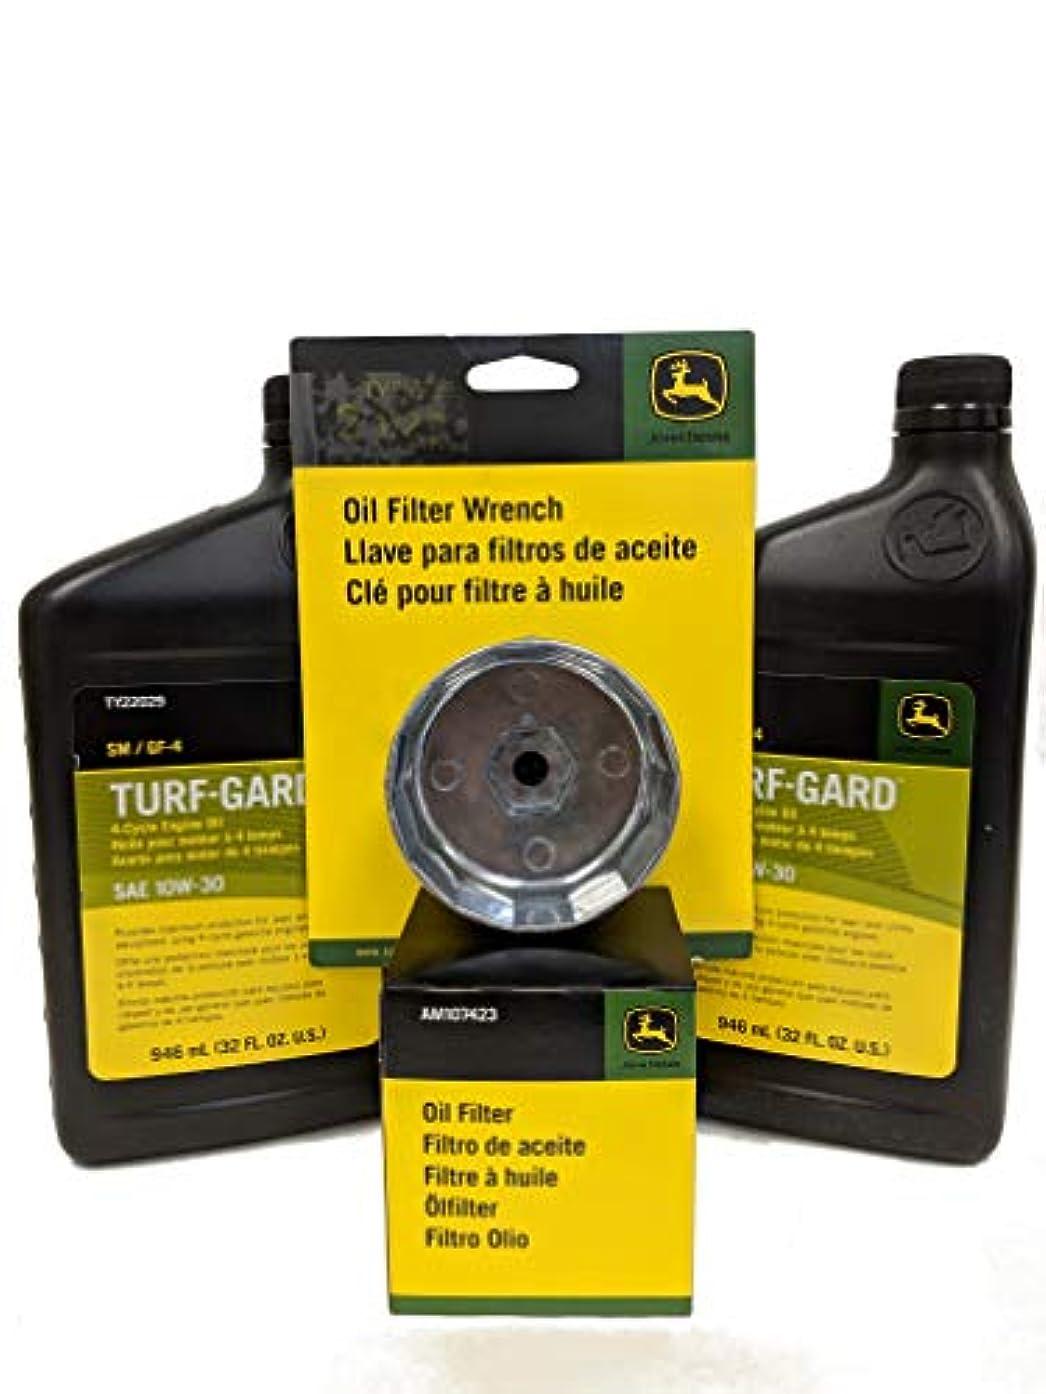 John Deere Original Equipment Oil Change Kit, Includes Wrench - (2) TY22029 + AM107423 + TY26639